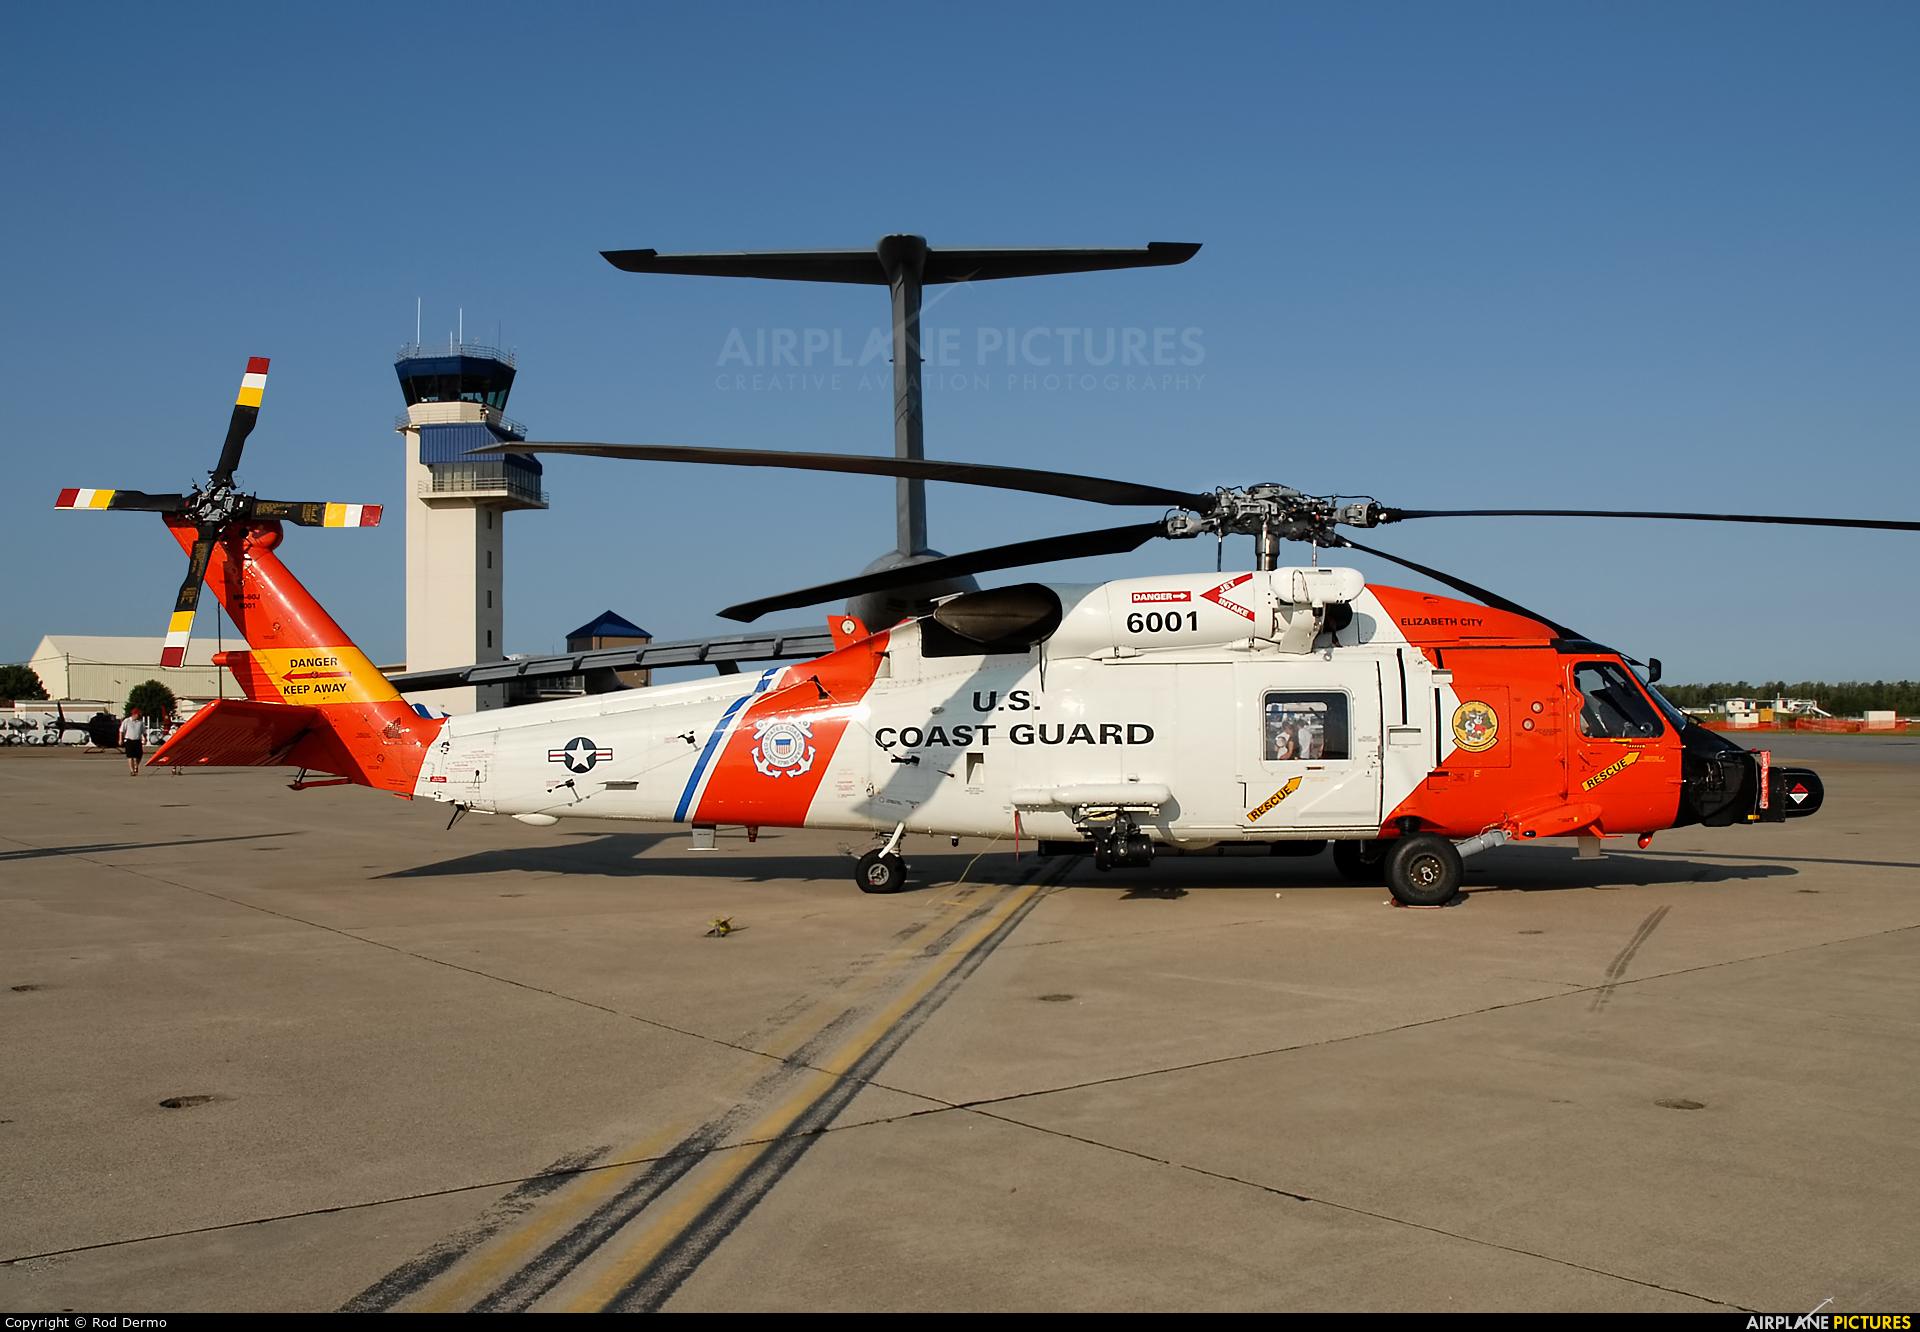 USA - Coast Guard 6001 aircraft at Oceana NAS